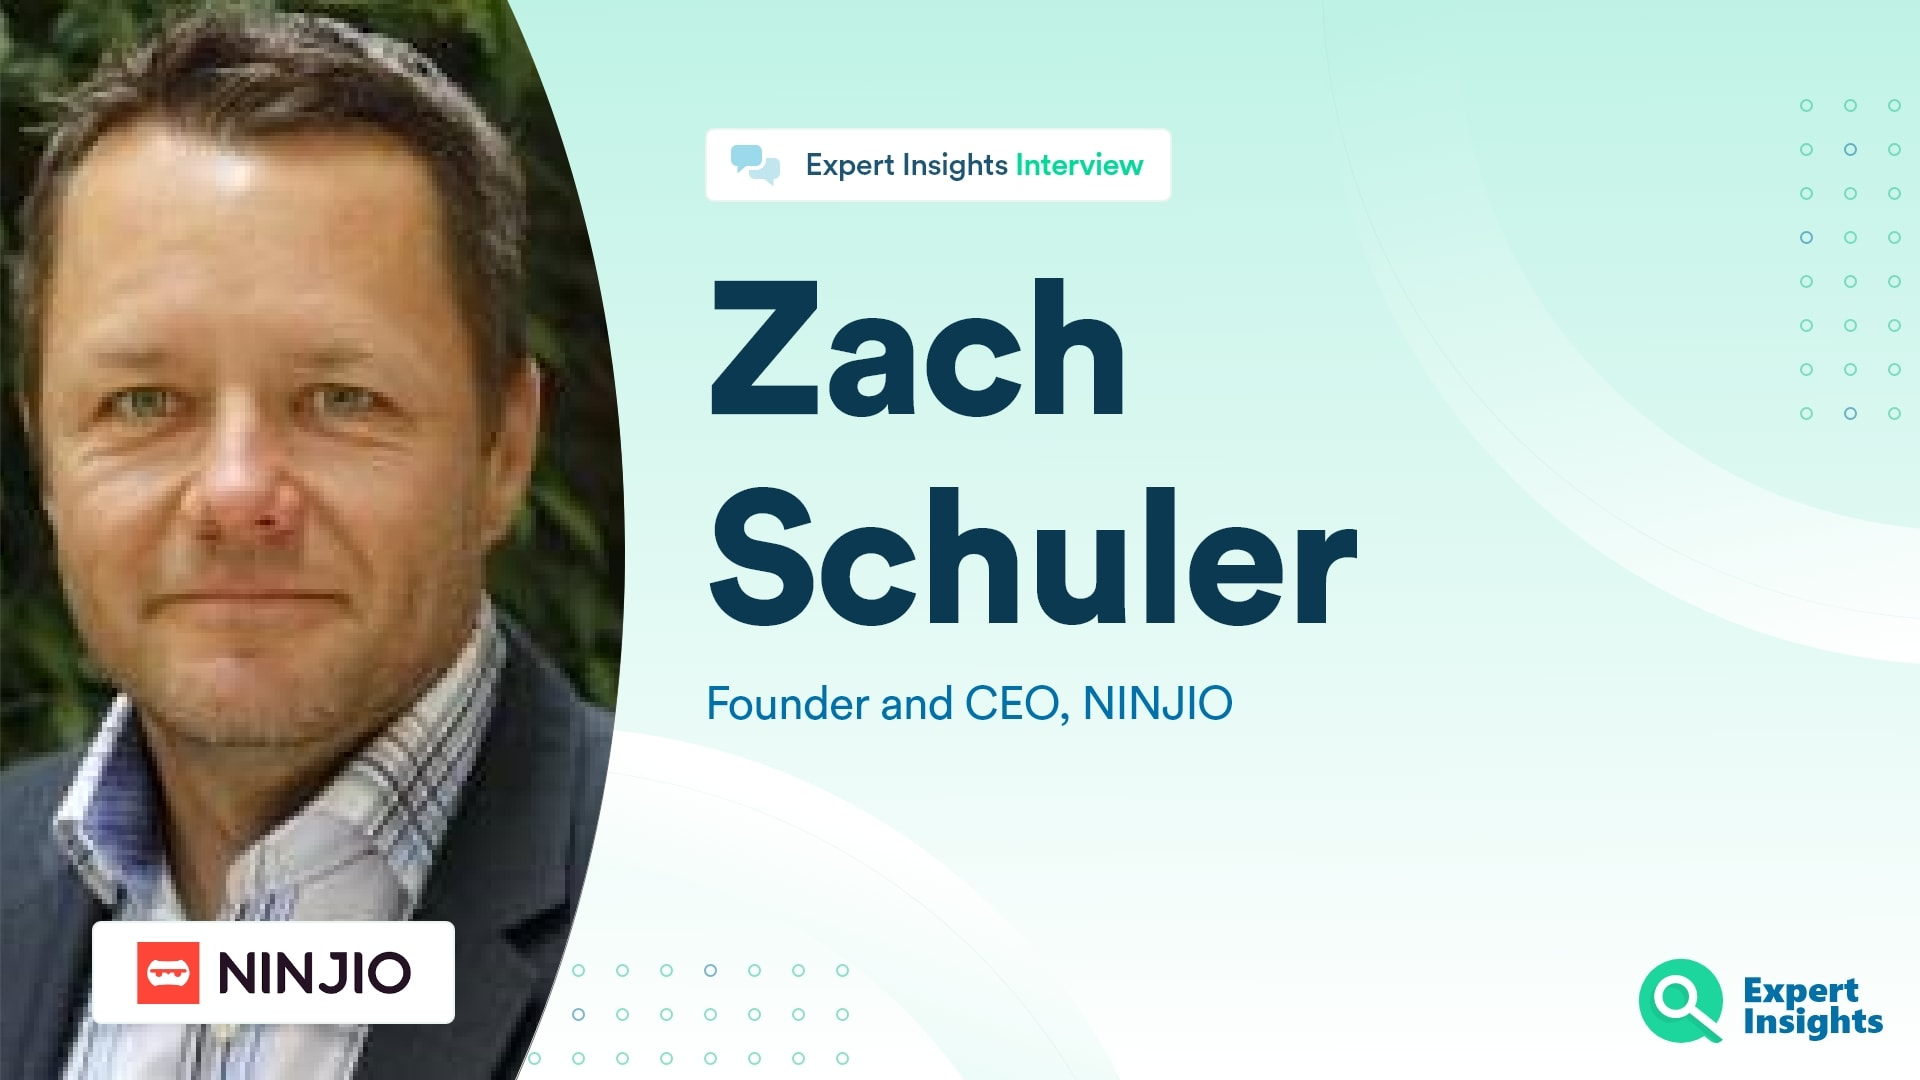 Expert Insights Interview With Zach Schuler Of Ninjio